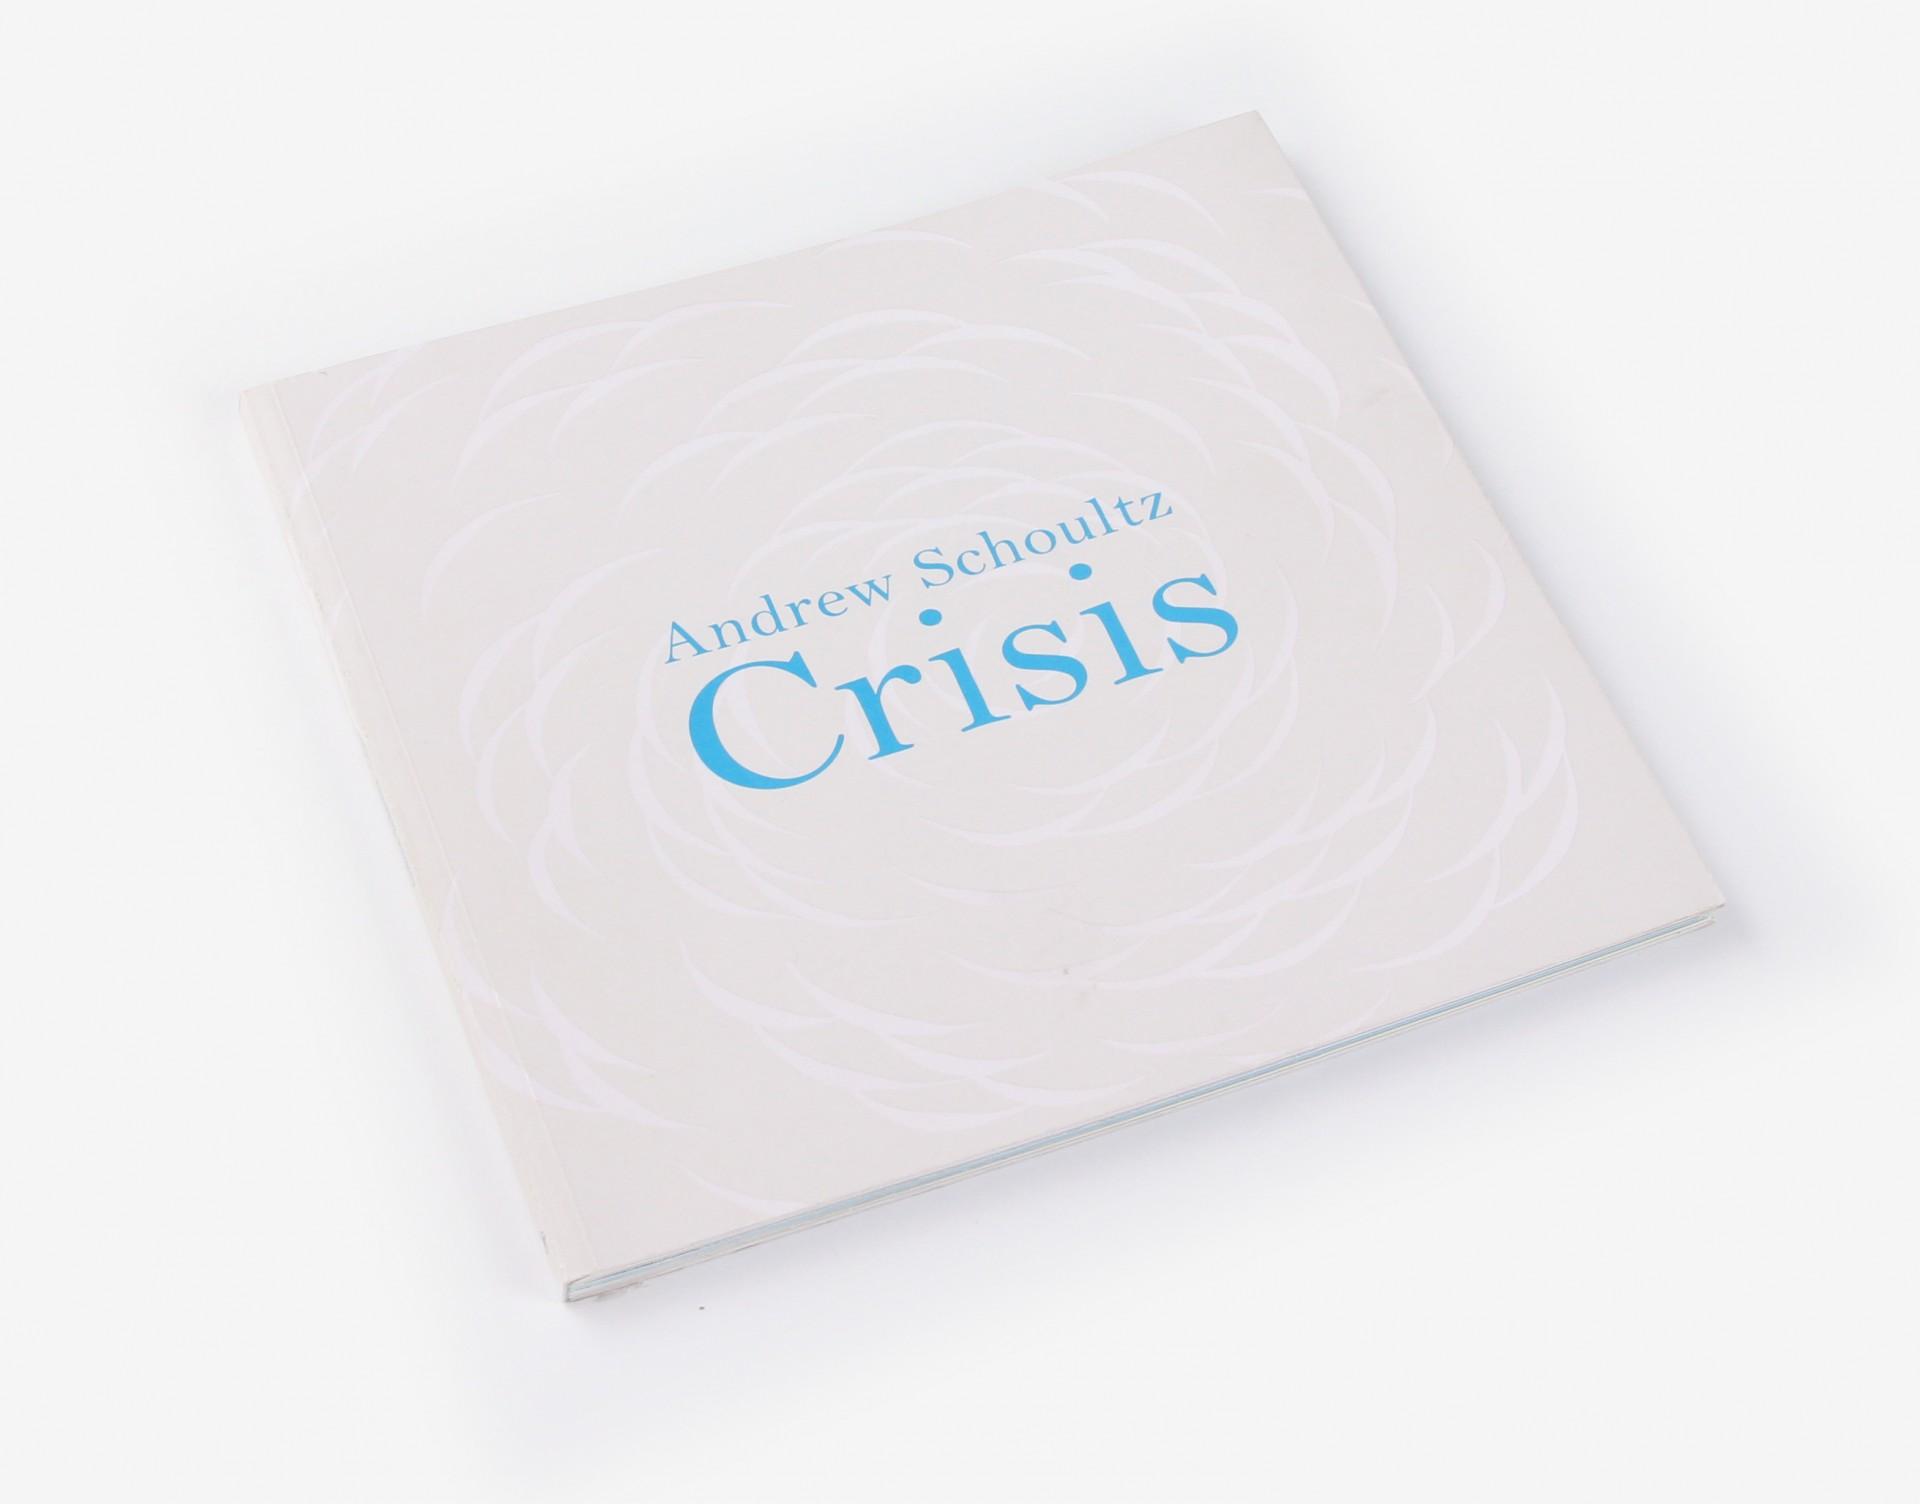 Andrew Shoultz - Crisis - Catalogo artista - Copertina